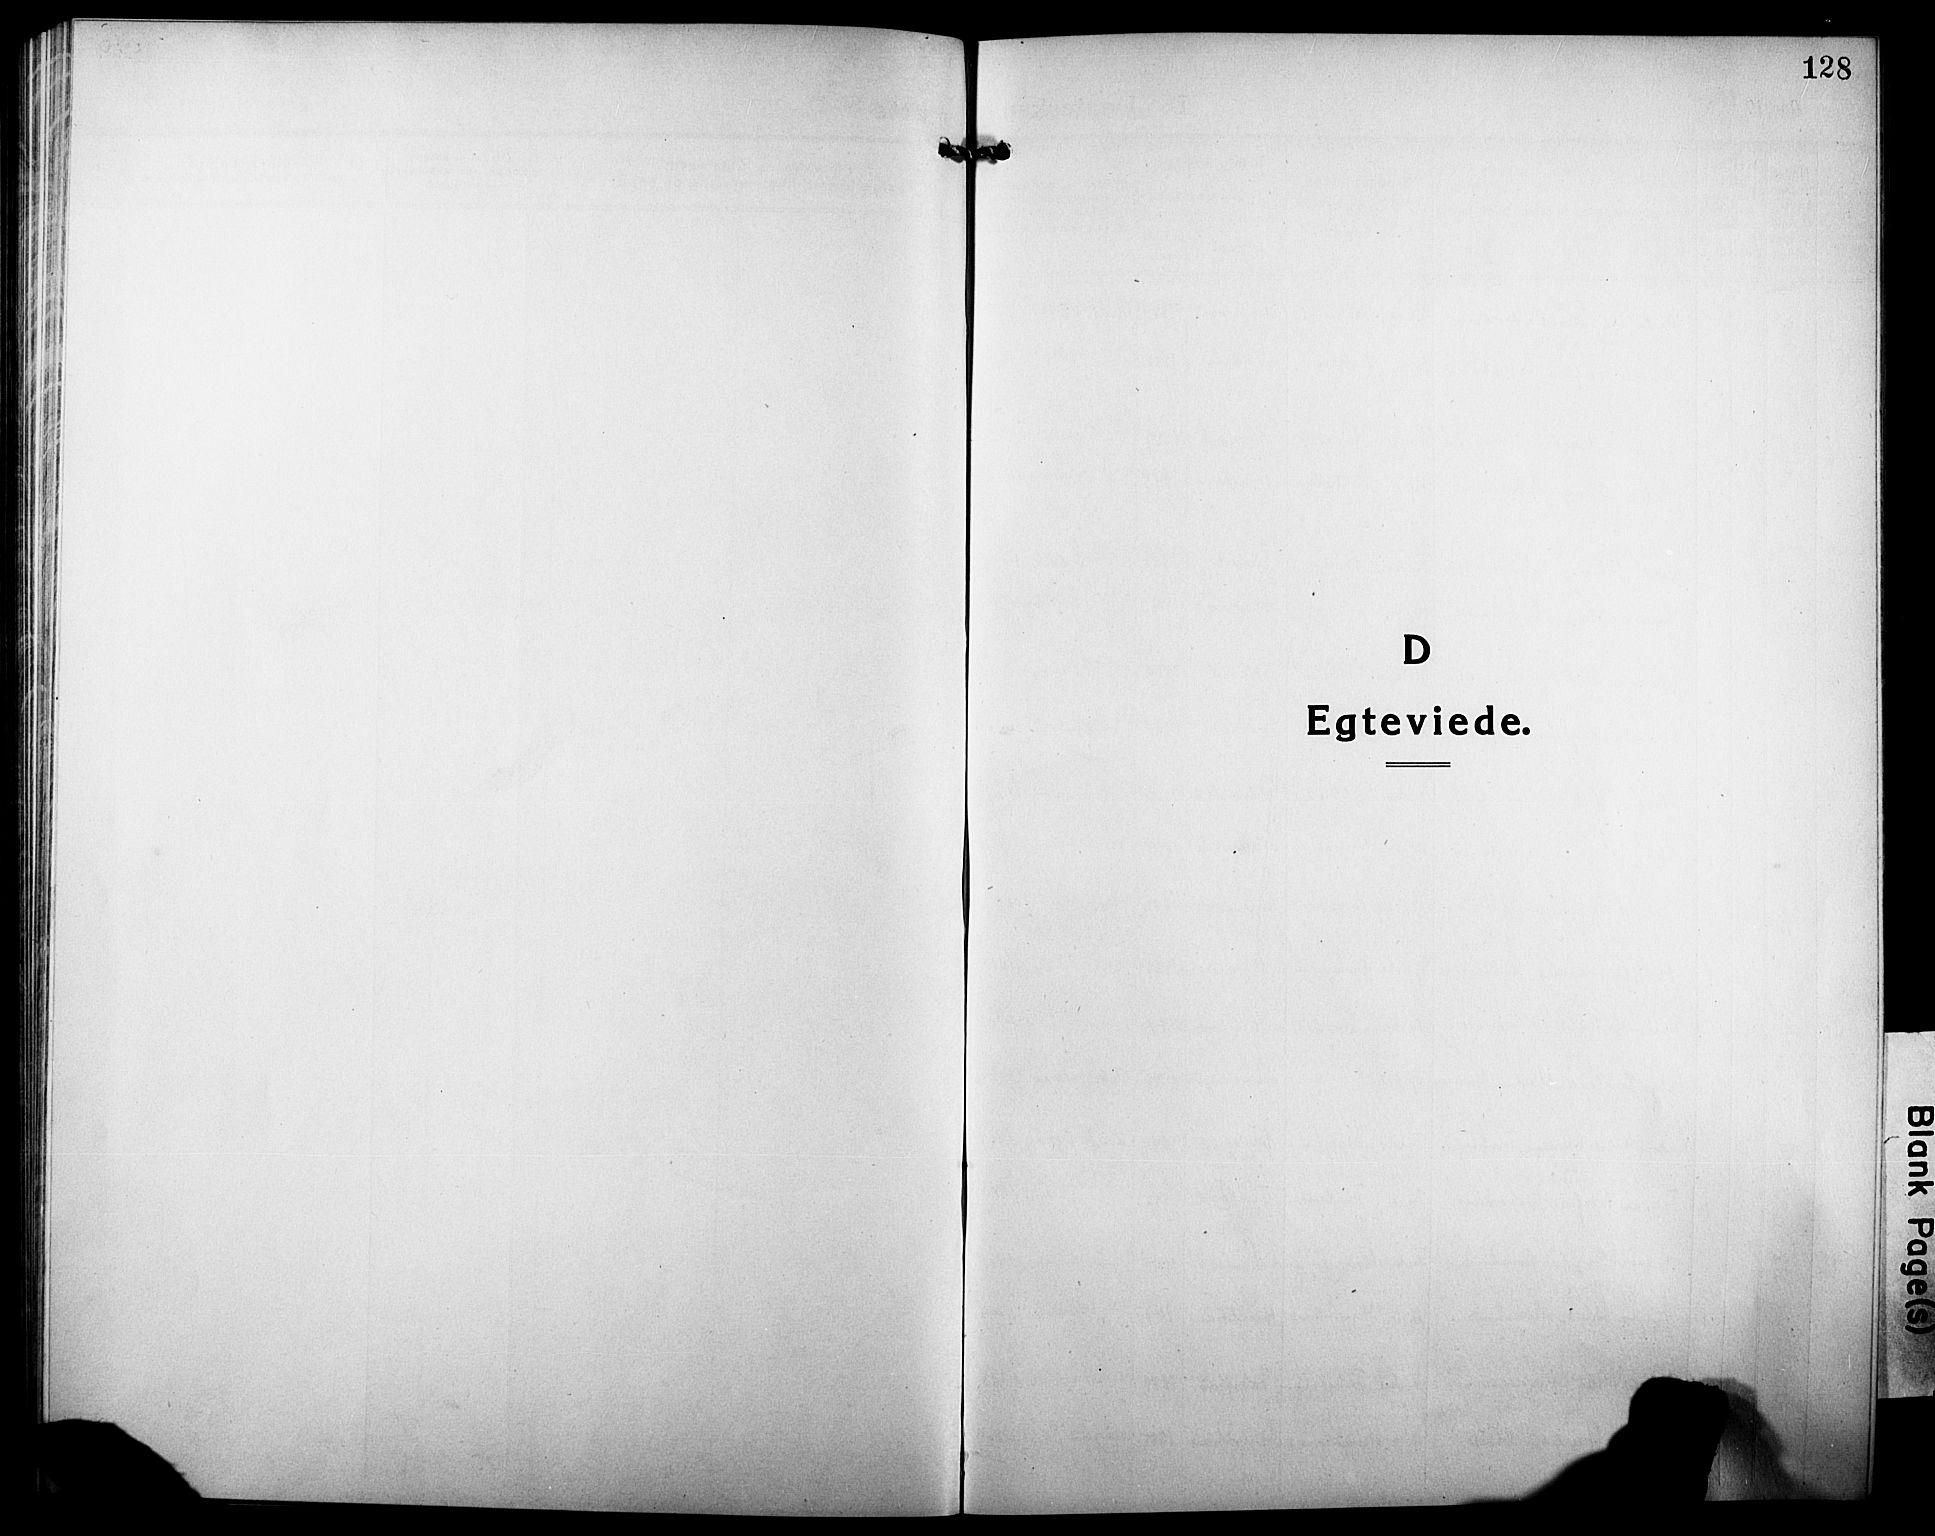 SATØ, Tranøy sokneprestkontor, I/Ia/Iab/L0006klokker: Klokkerbok nr. 6, 1919-1932, s. 128